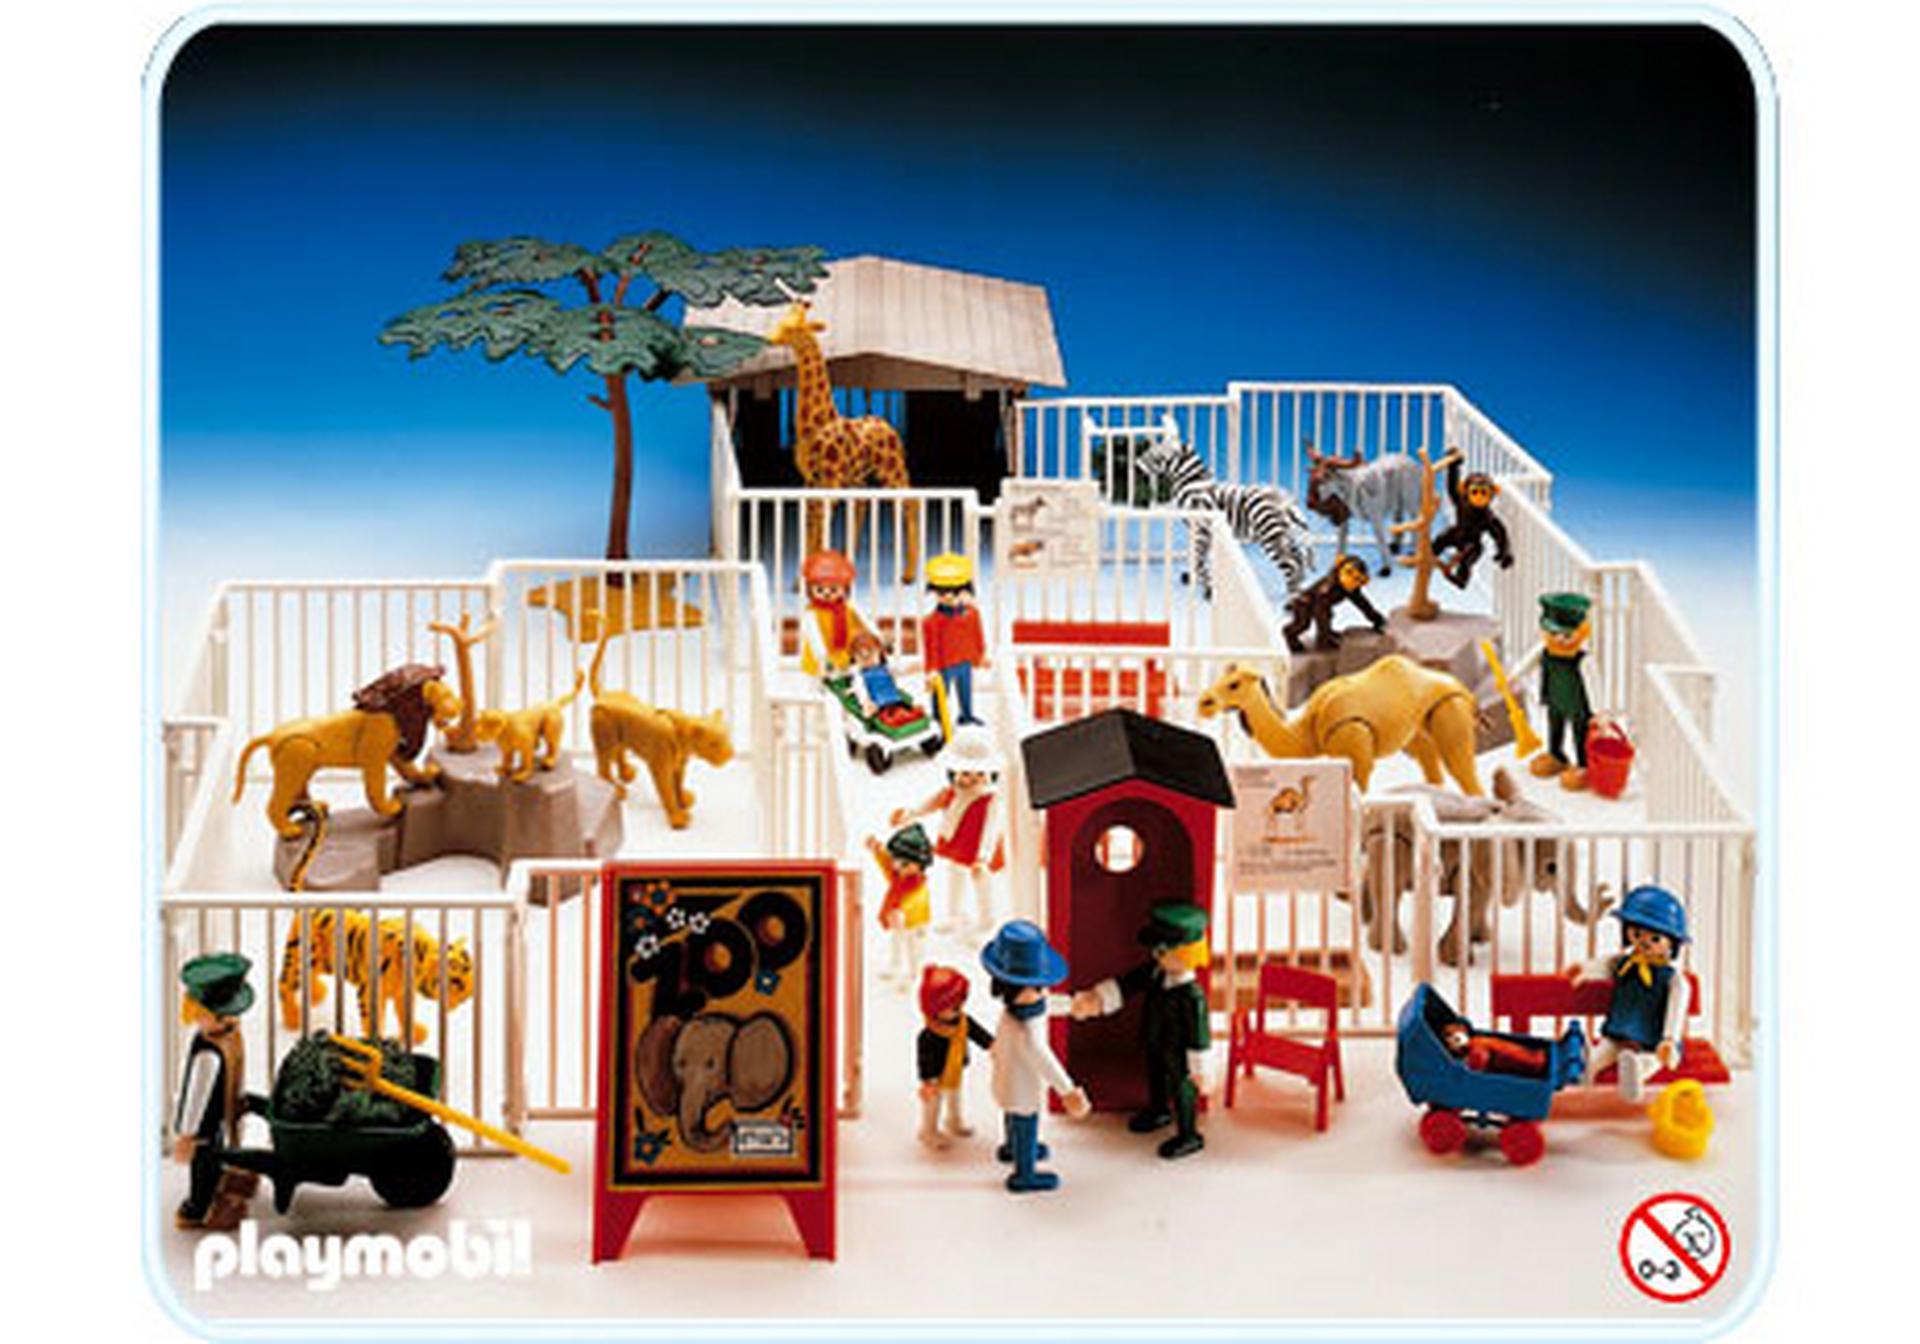 zoo 3145 a playmobil schweiz. Black Bedroom Furniture Sets. Home Design Ideas